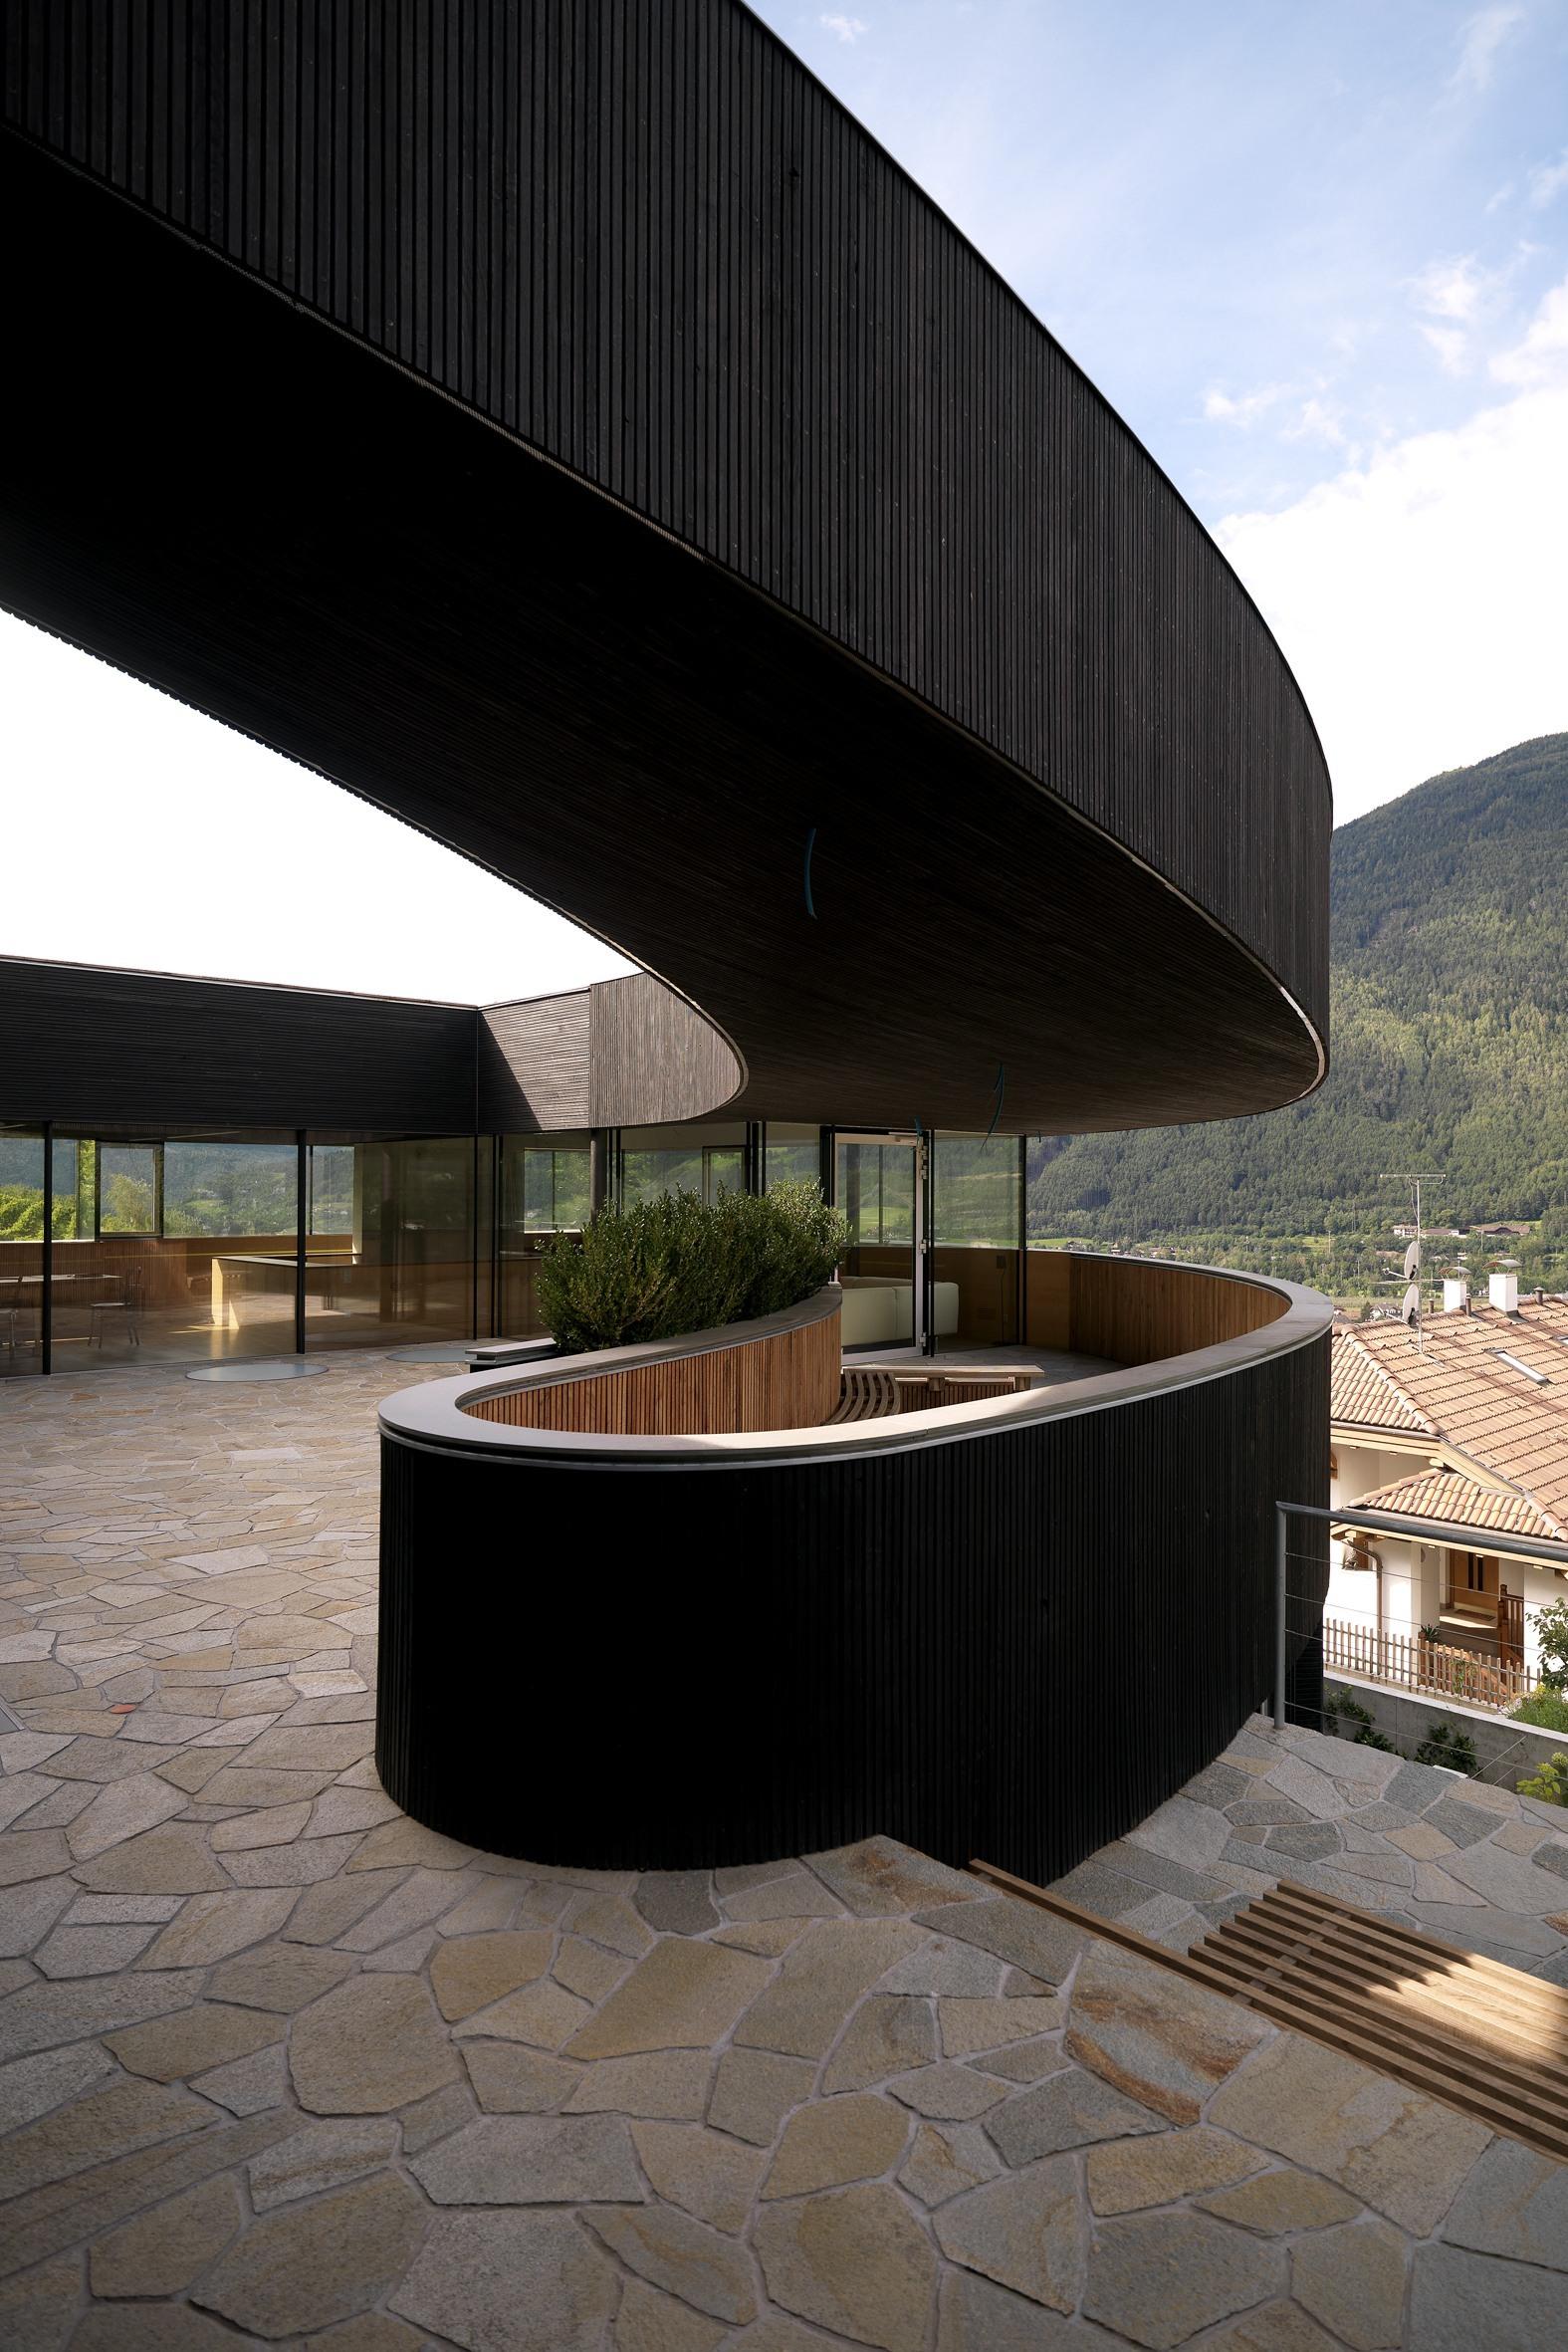 luxury home house architecture sky building window door structure design